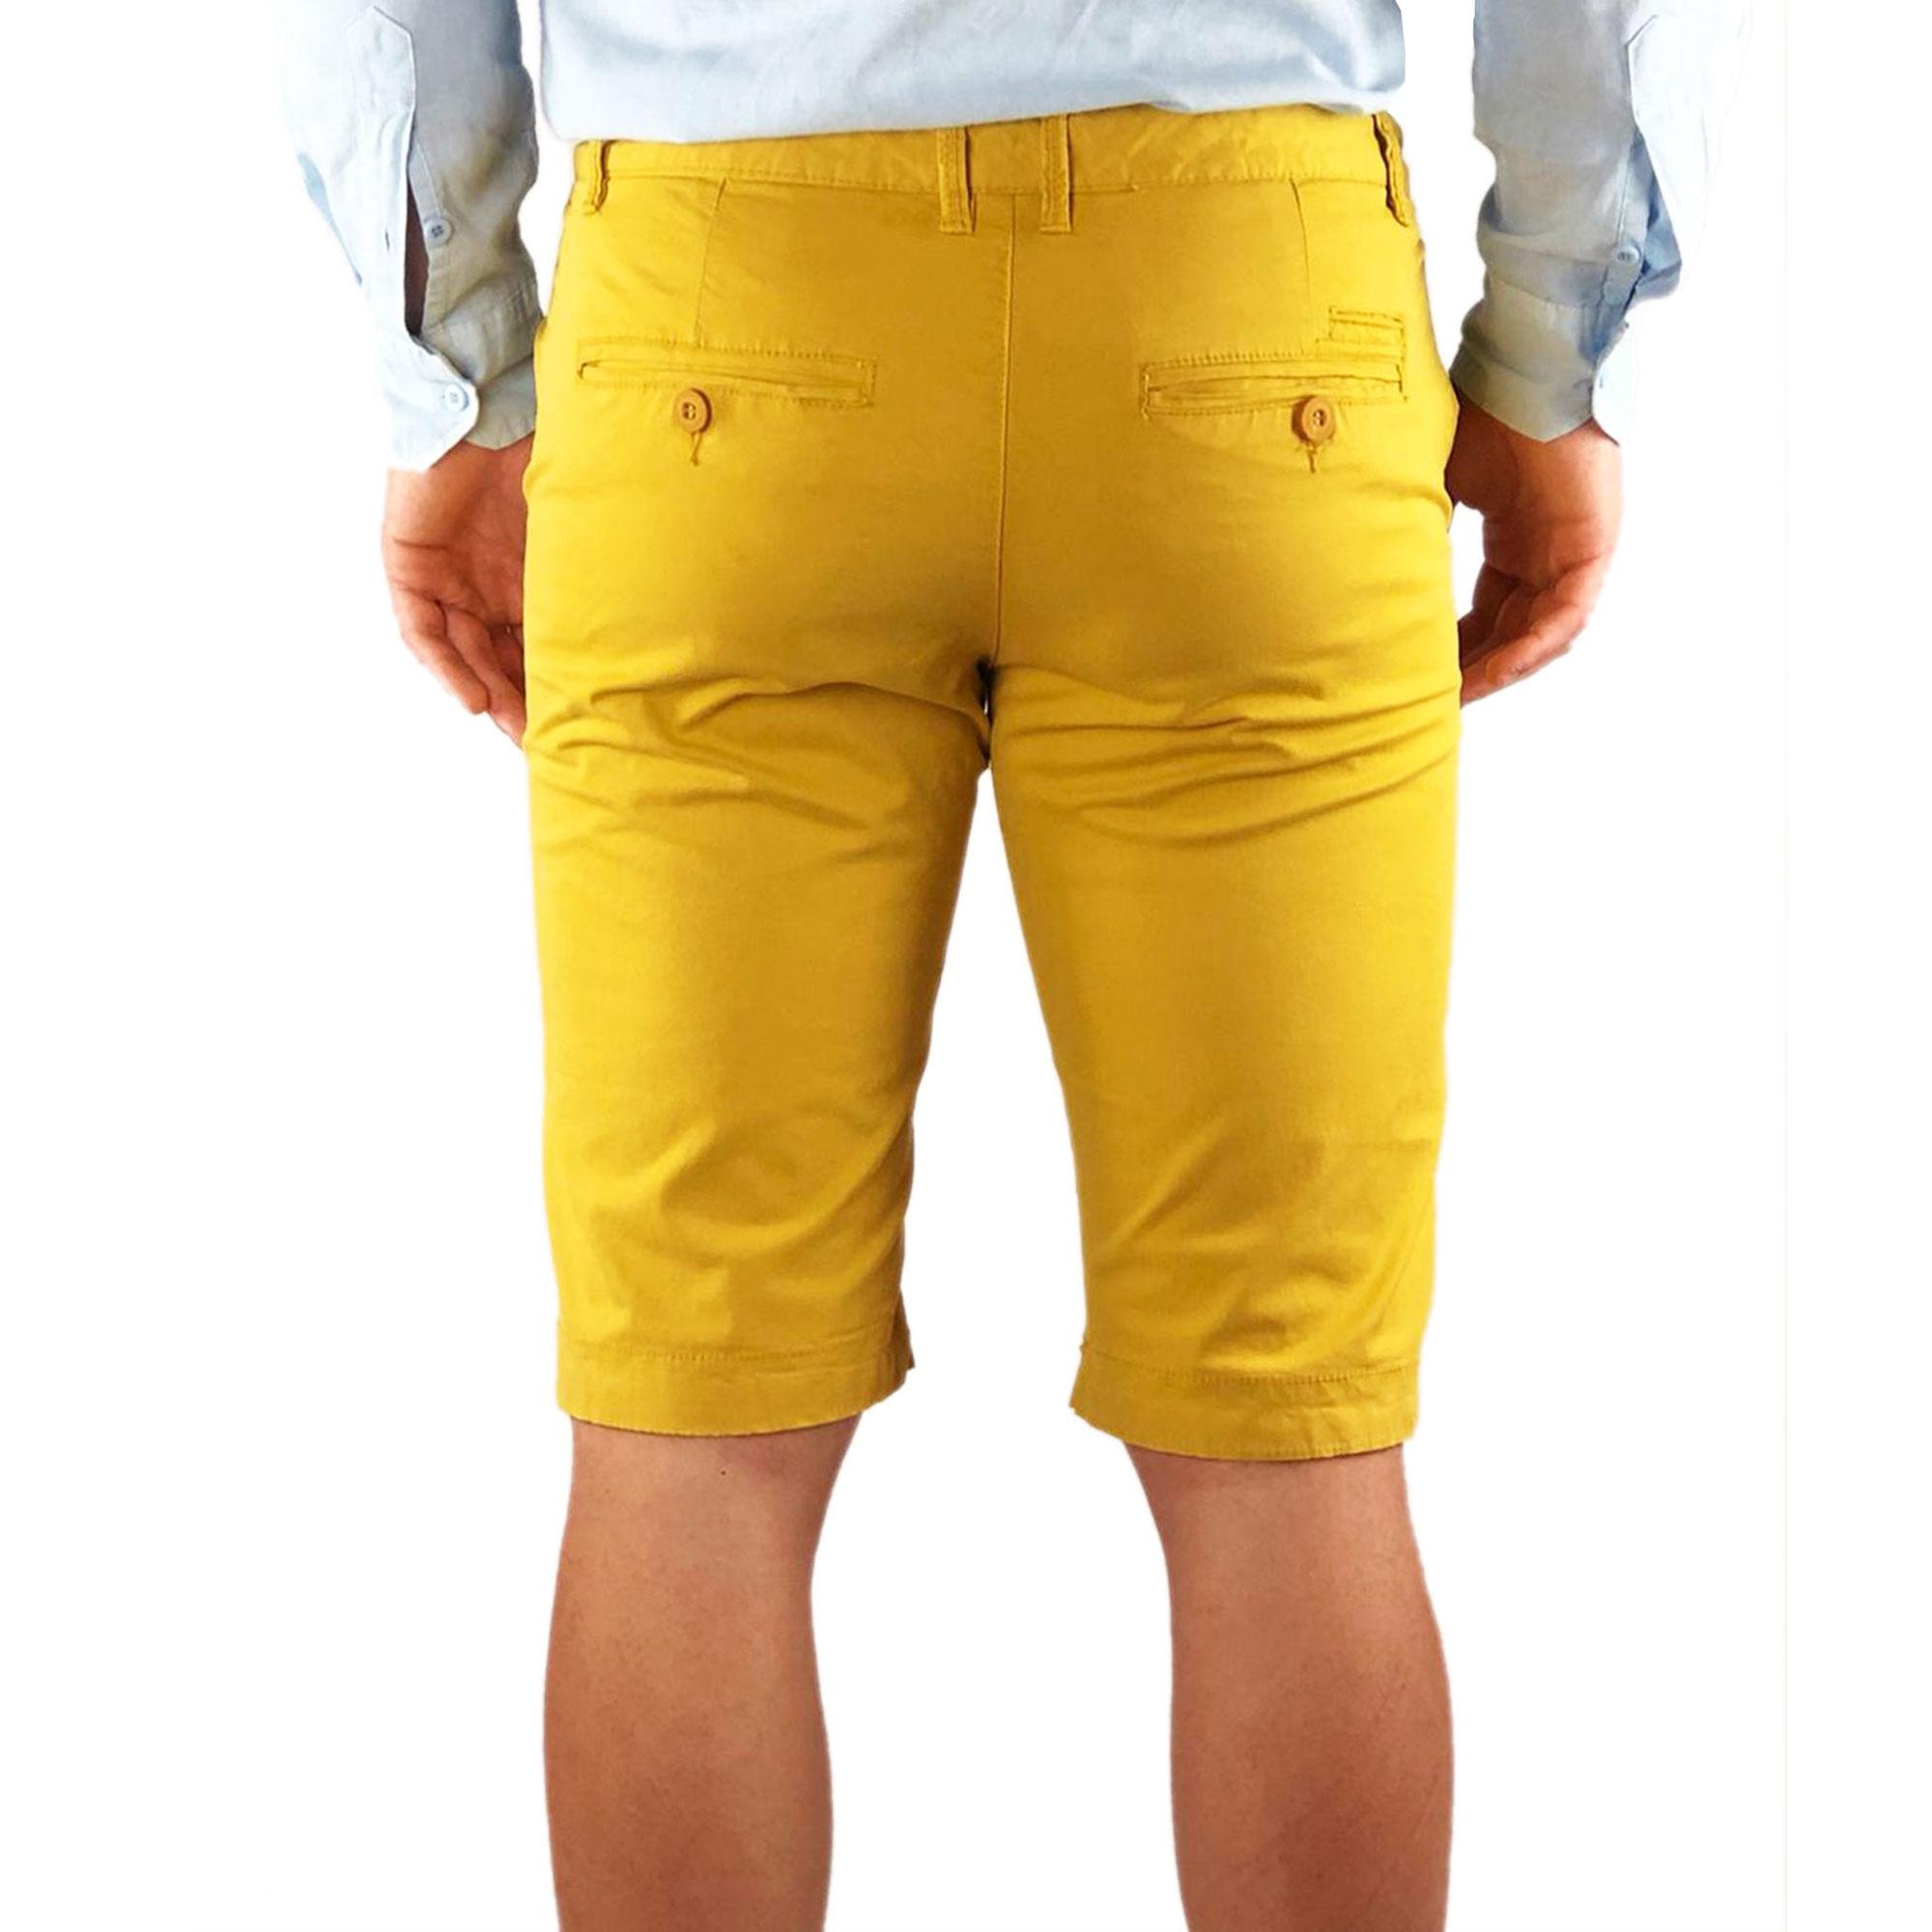 Bermuda-Uomo-Cotone-Slim-Fit-Jeans-Pantalone-Corto-Shorts-Pantaloncini-Casual miniatura 18